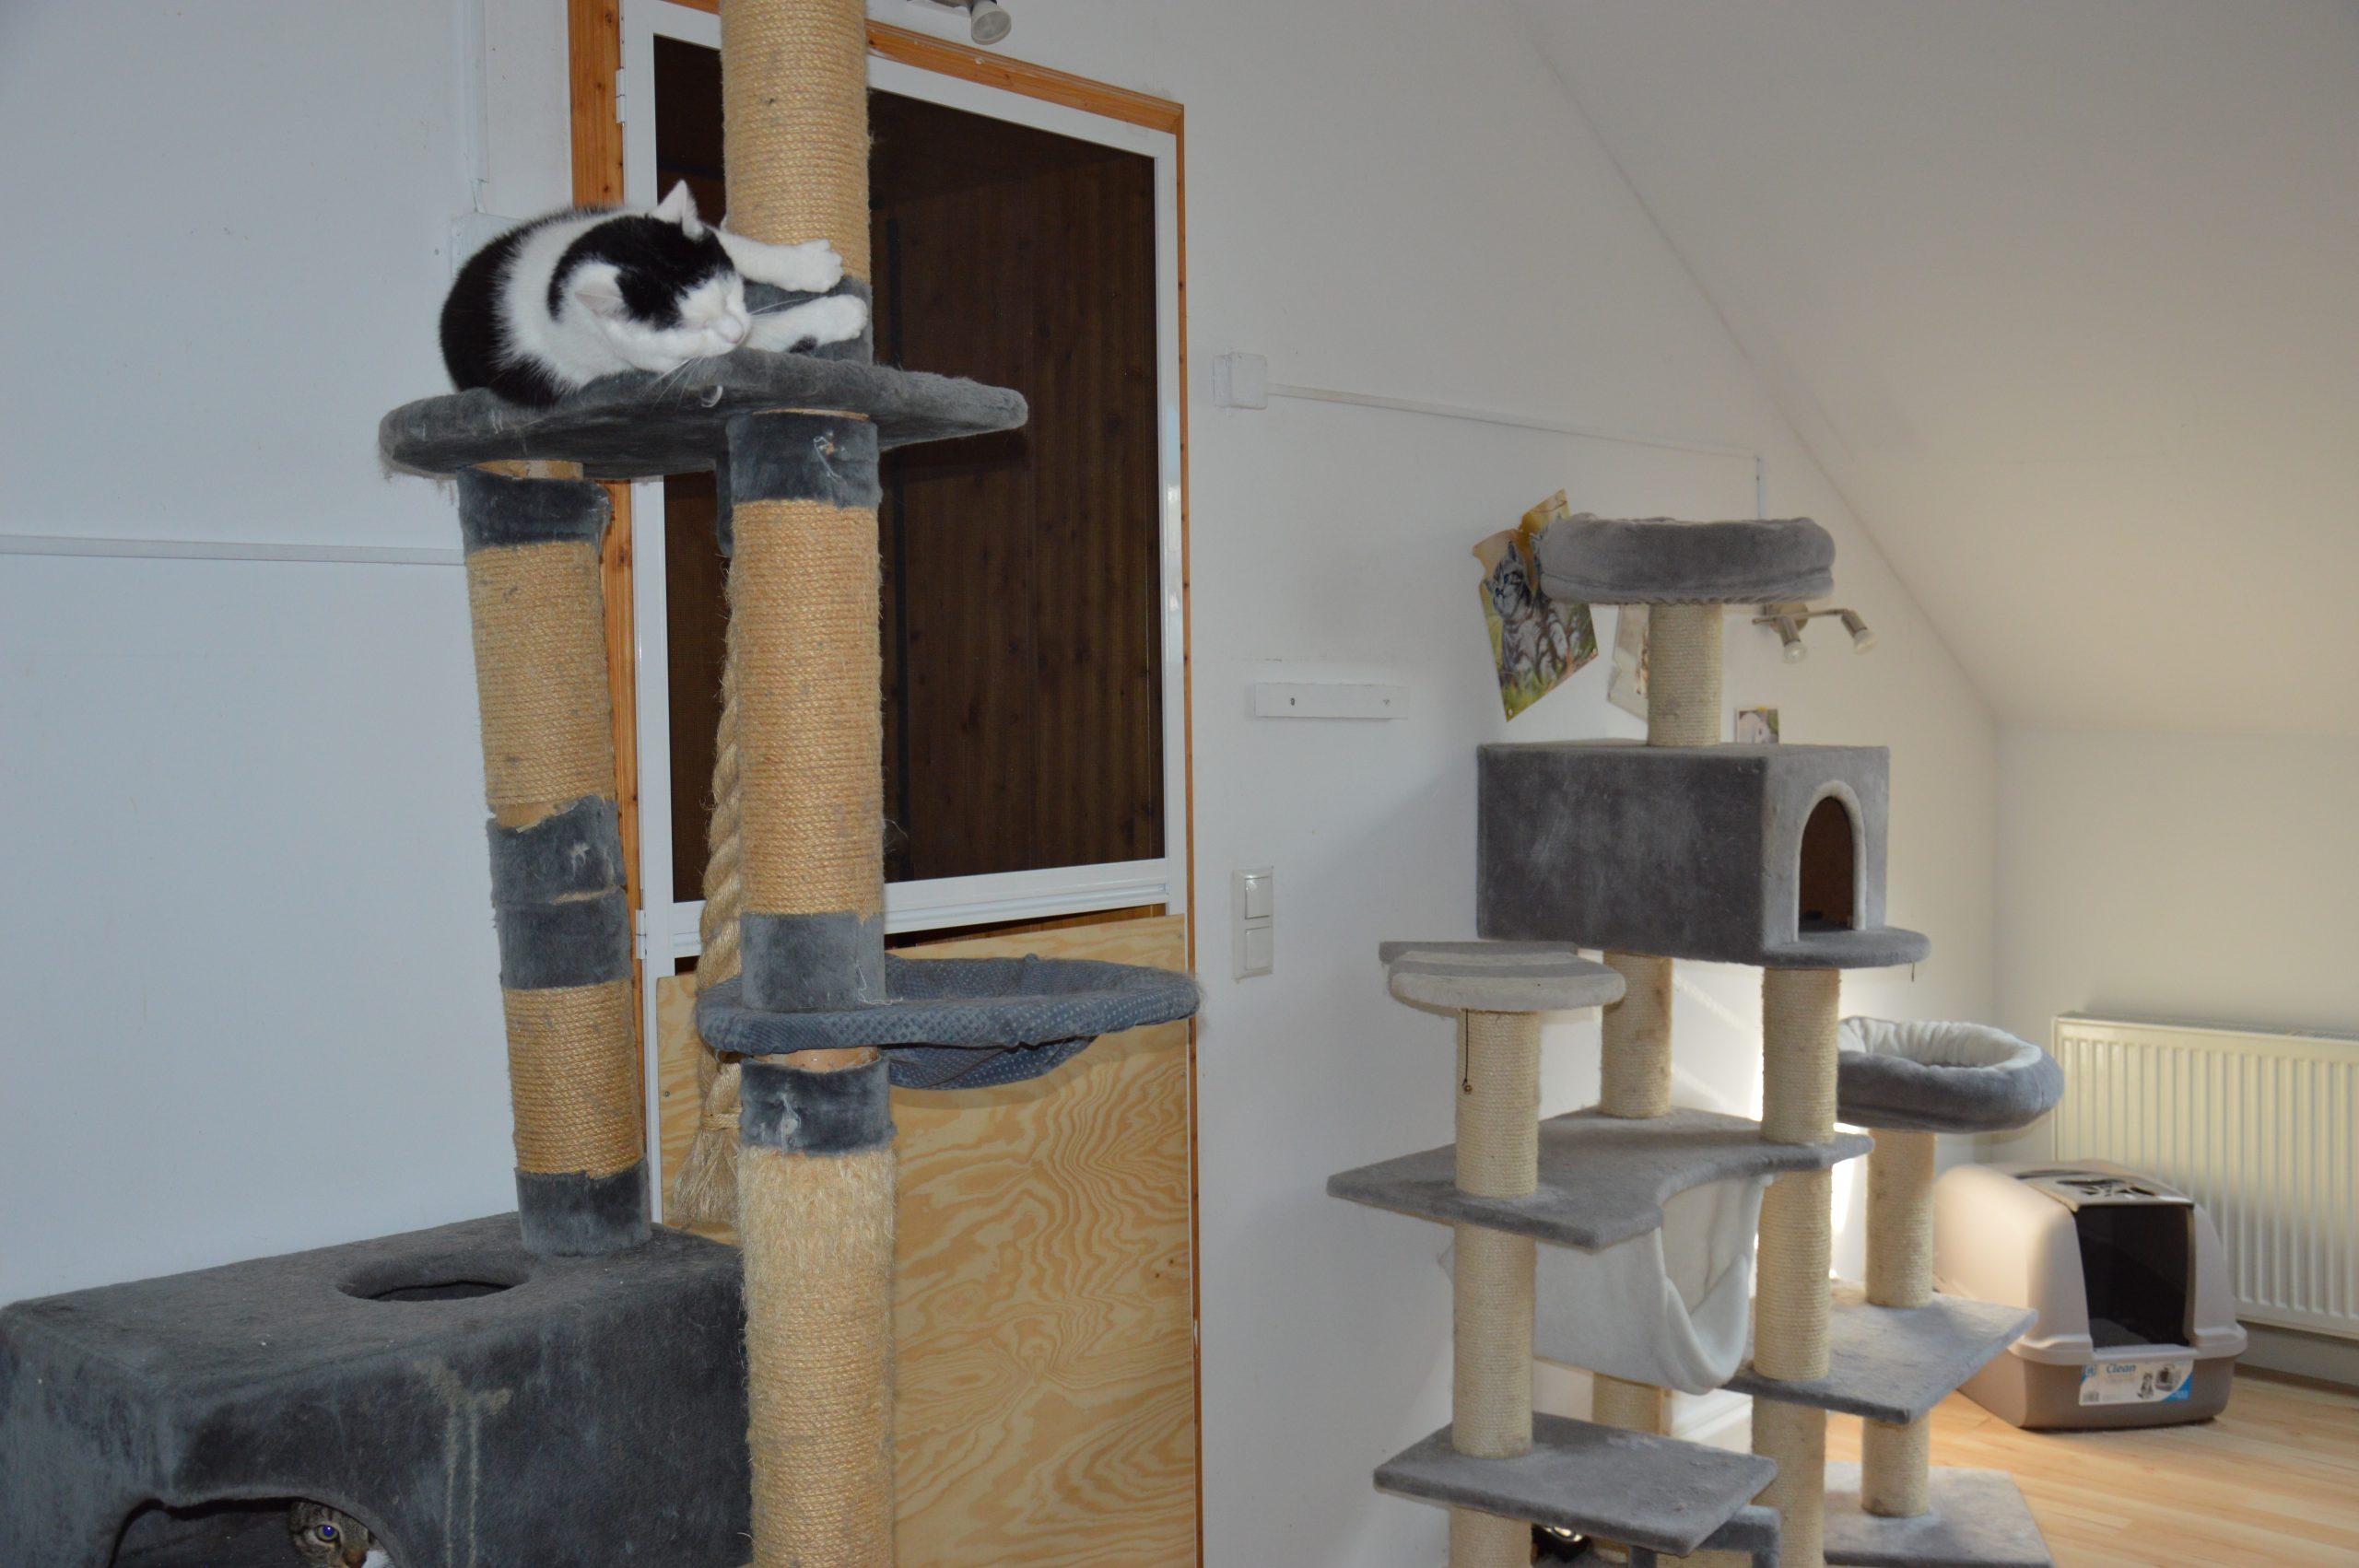 Unsere Katzenzimmer (03)